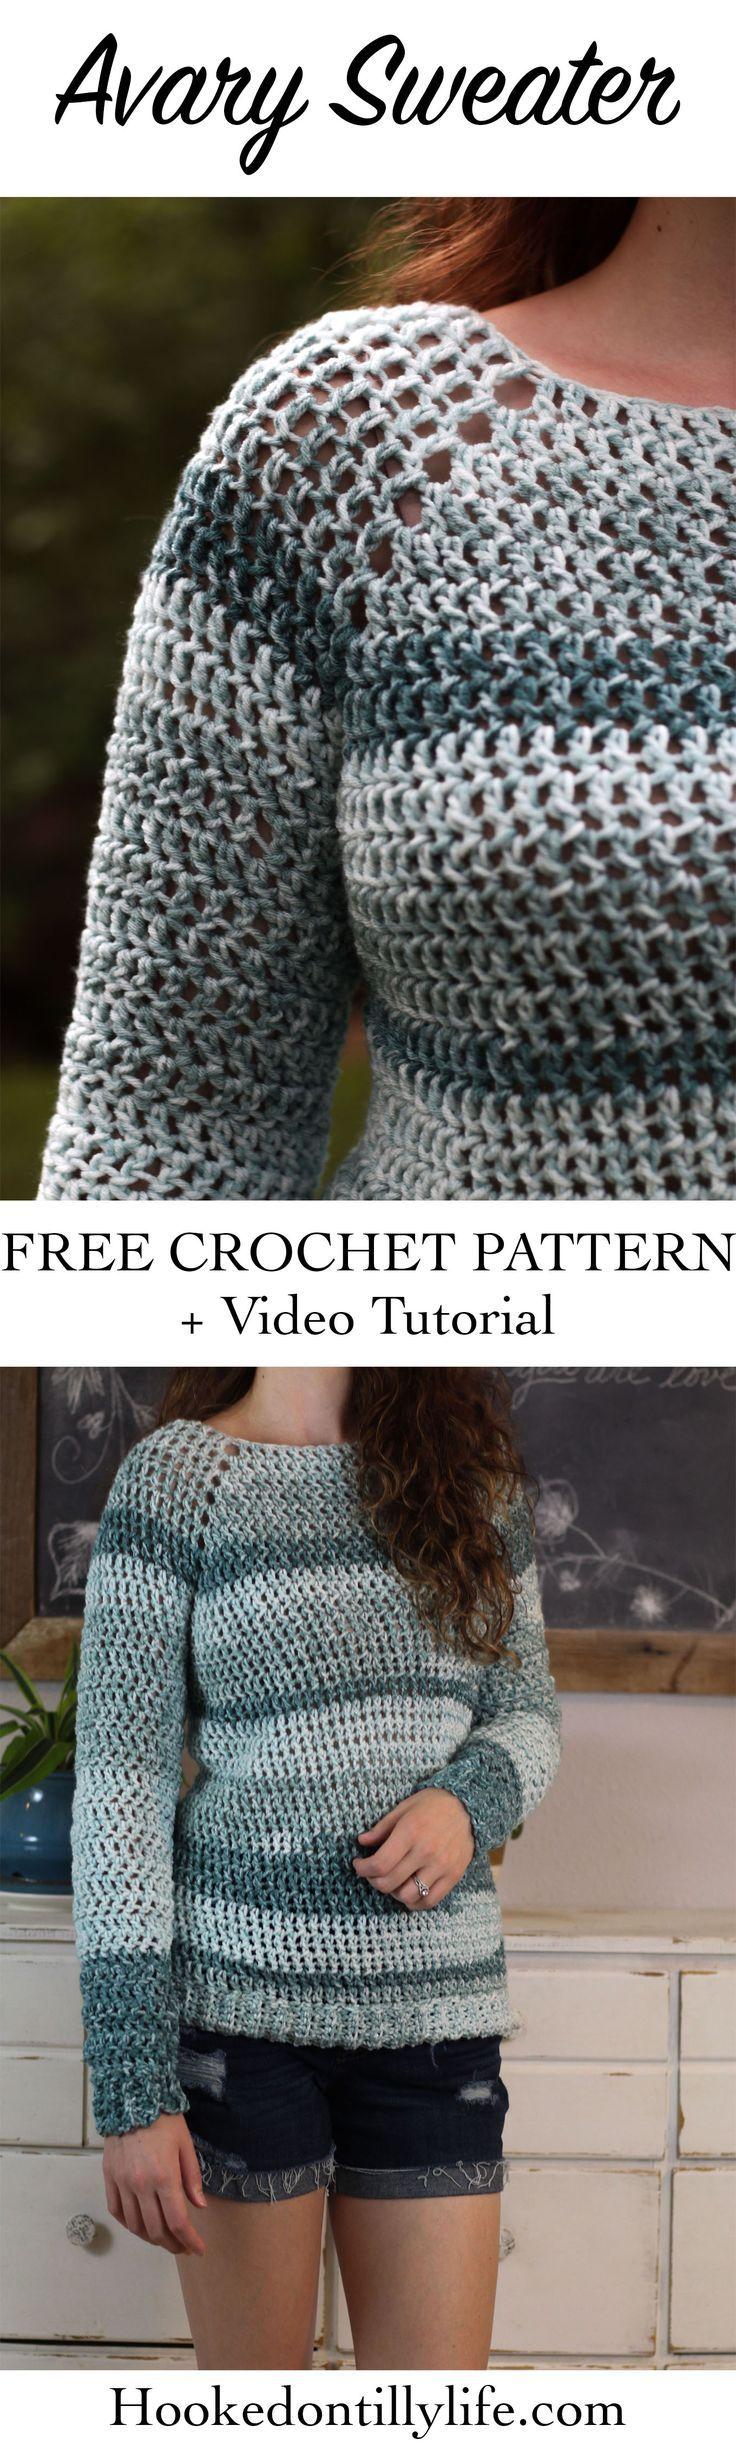 The Avary Sweater – Free Crochet Pattern